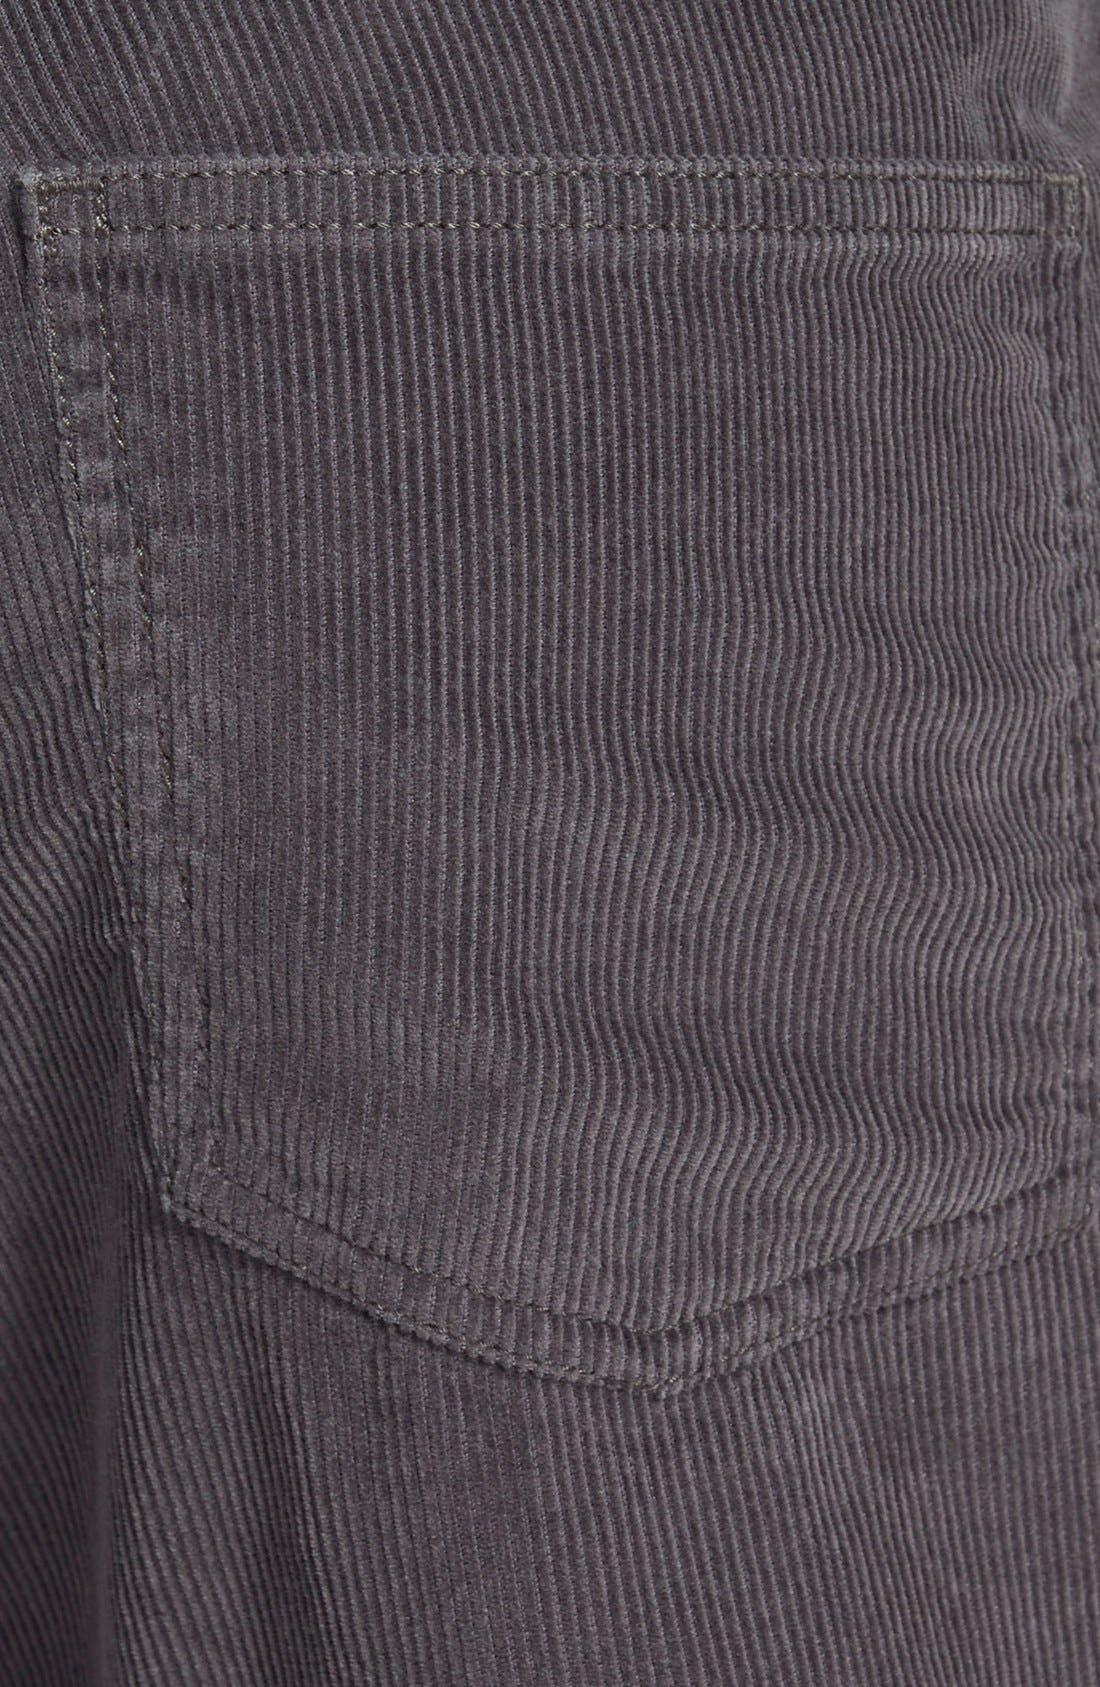 Straight Leg Corduroy Pants,                             Alternate thumbnail 2, color,                             021